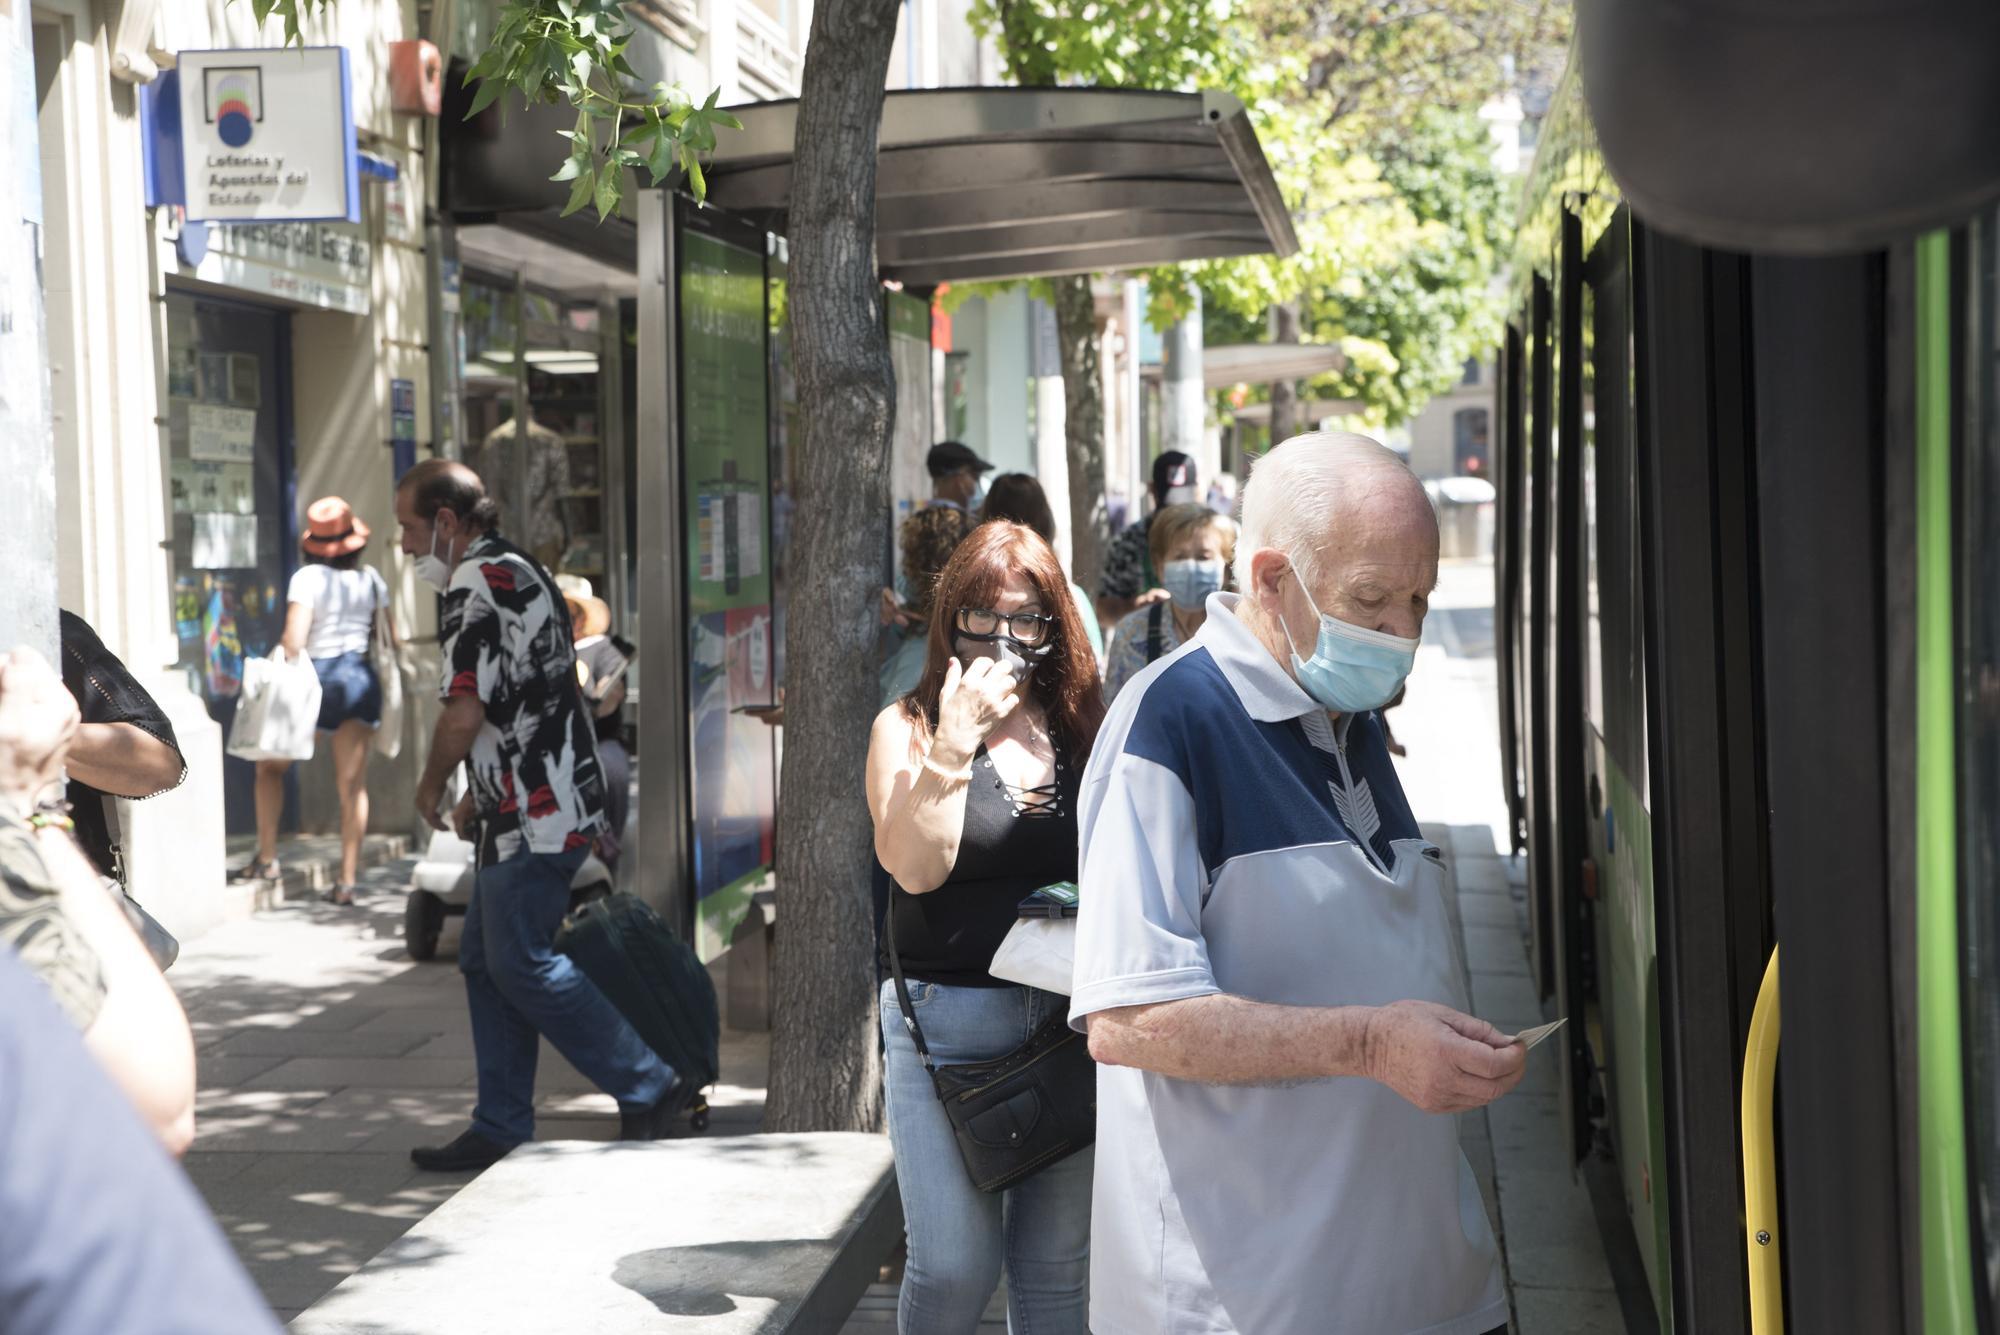 Primer dia sense mascareta en espais exteriors a Manresa